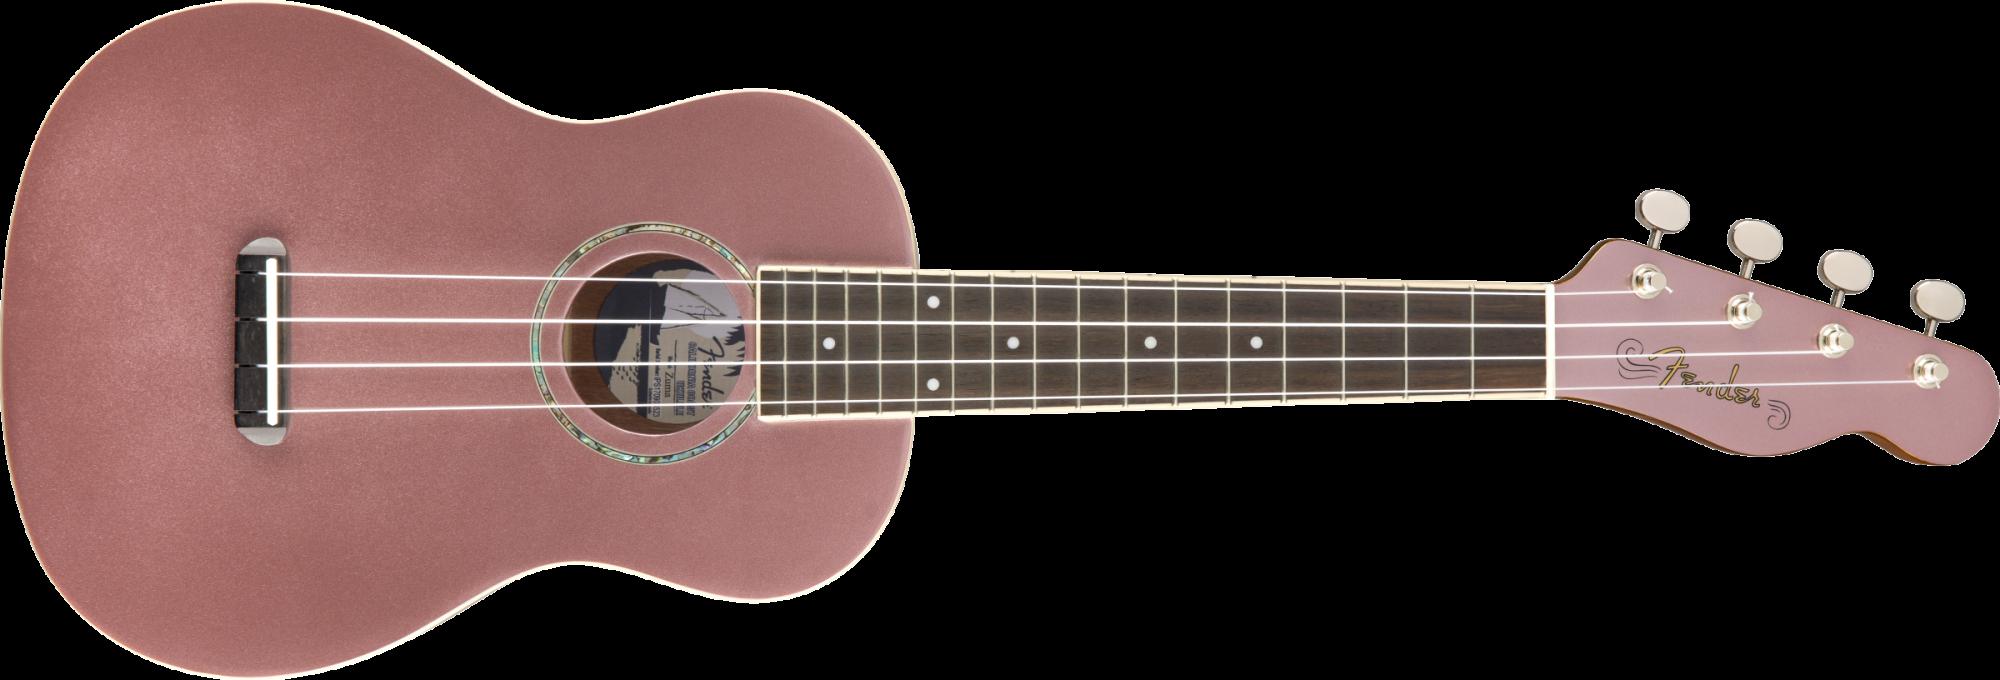 Fender Zuma Classic Concert Uke, Walnut Fingerboard, Burgundy Mist